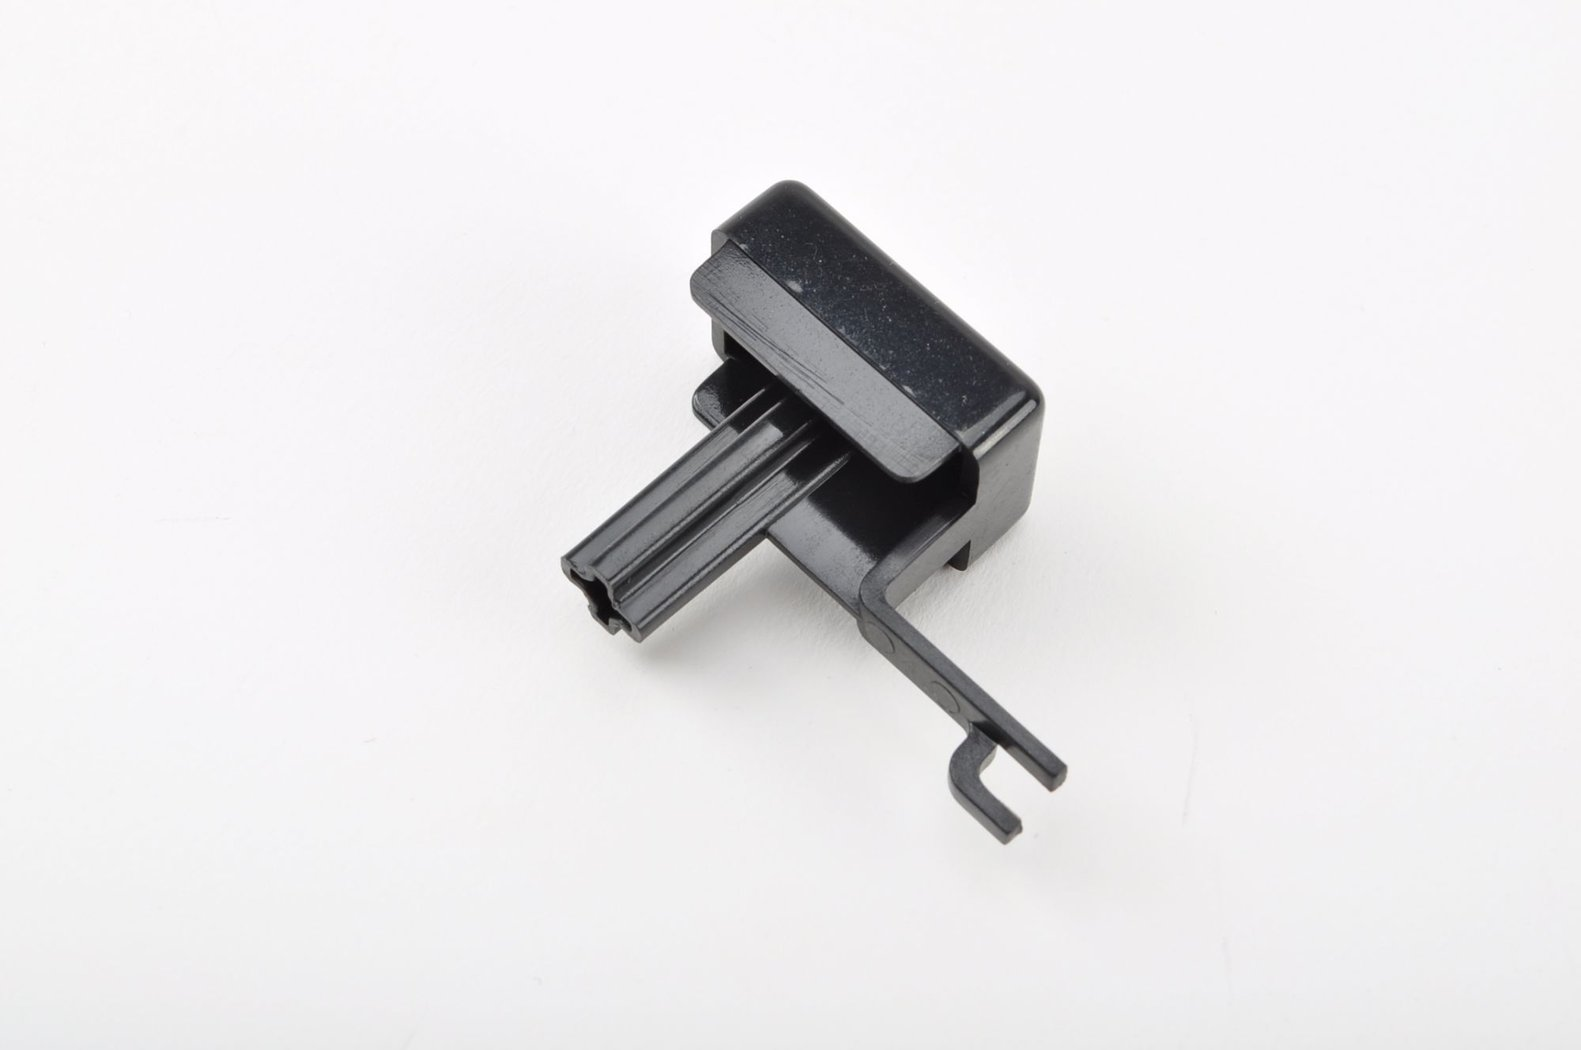 druck taste knopf schwarz f r netzschalter sp lmaschine alno u a. Black Bedroom Furniture Sets. Home Design Ideas